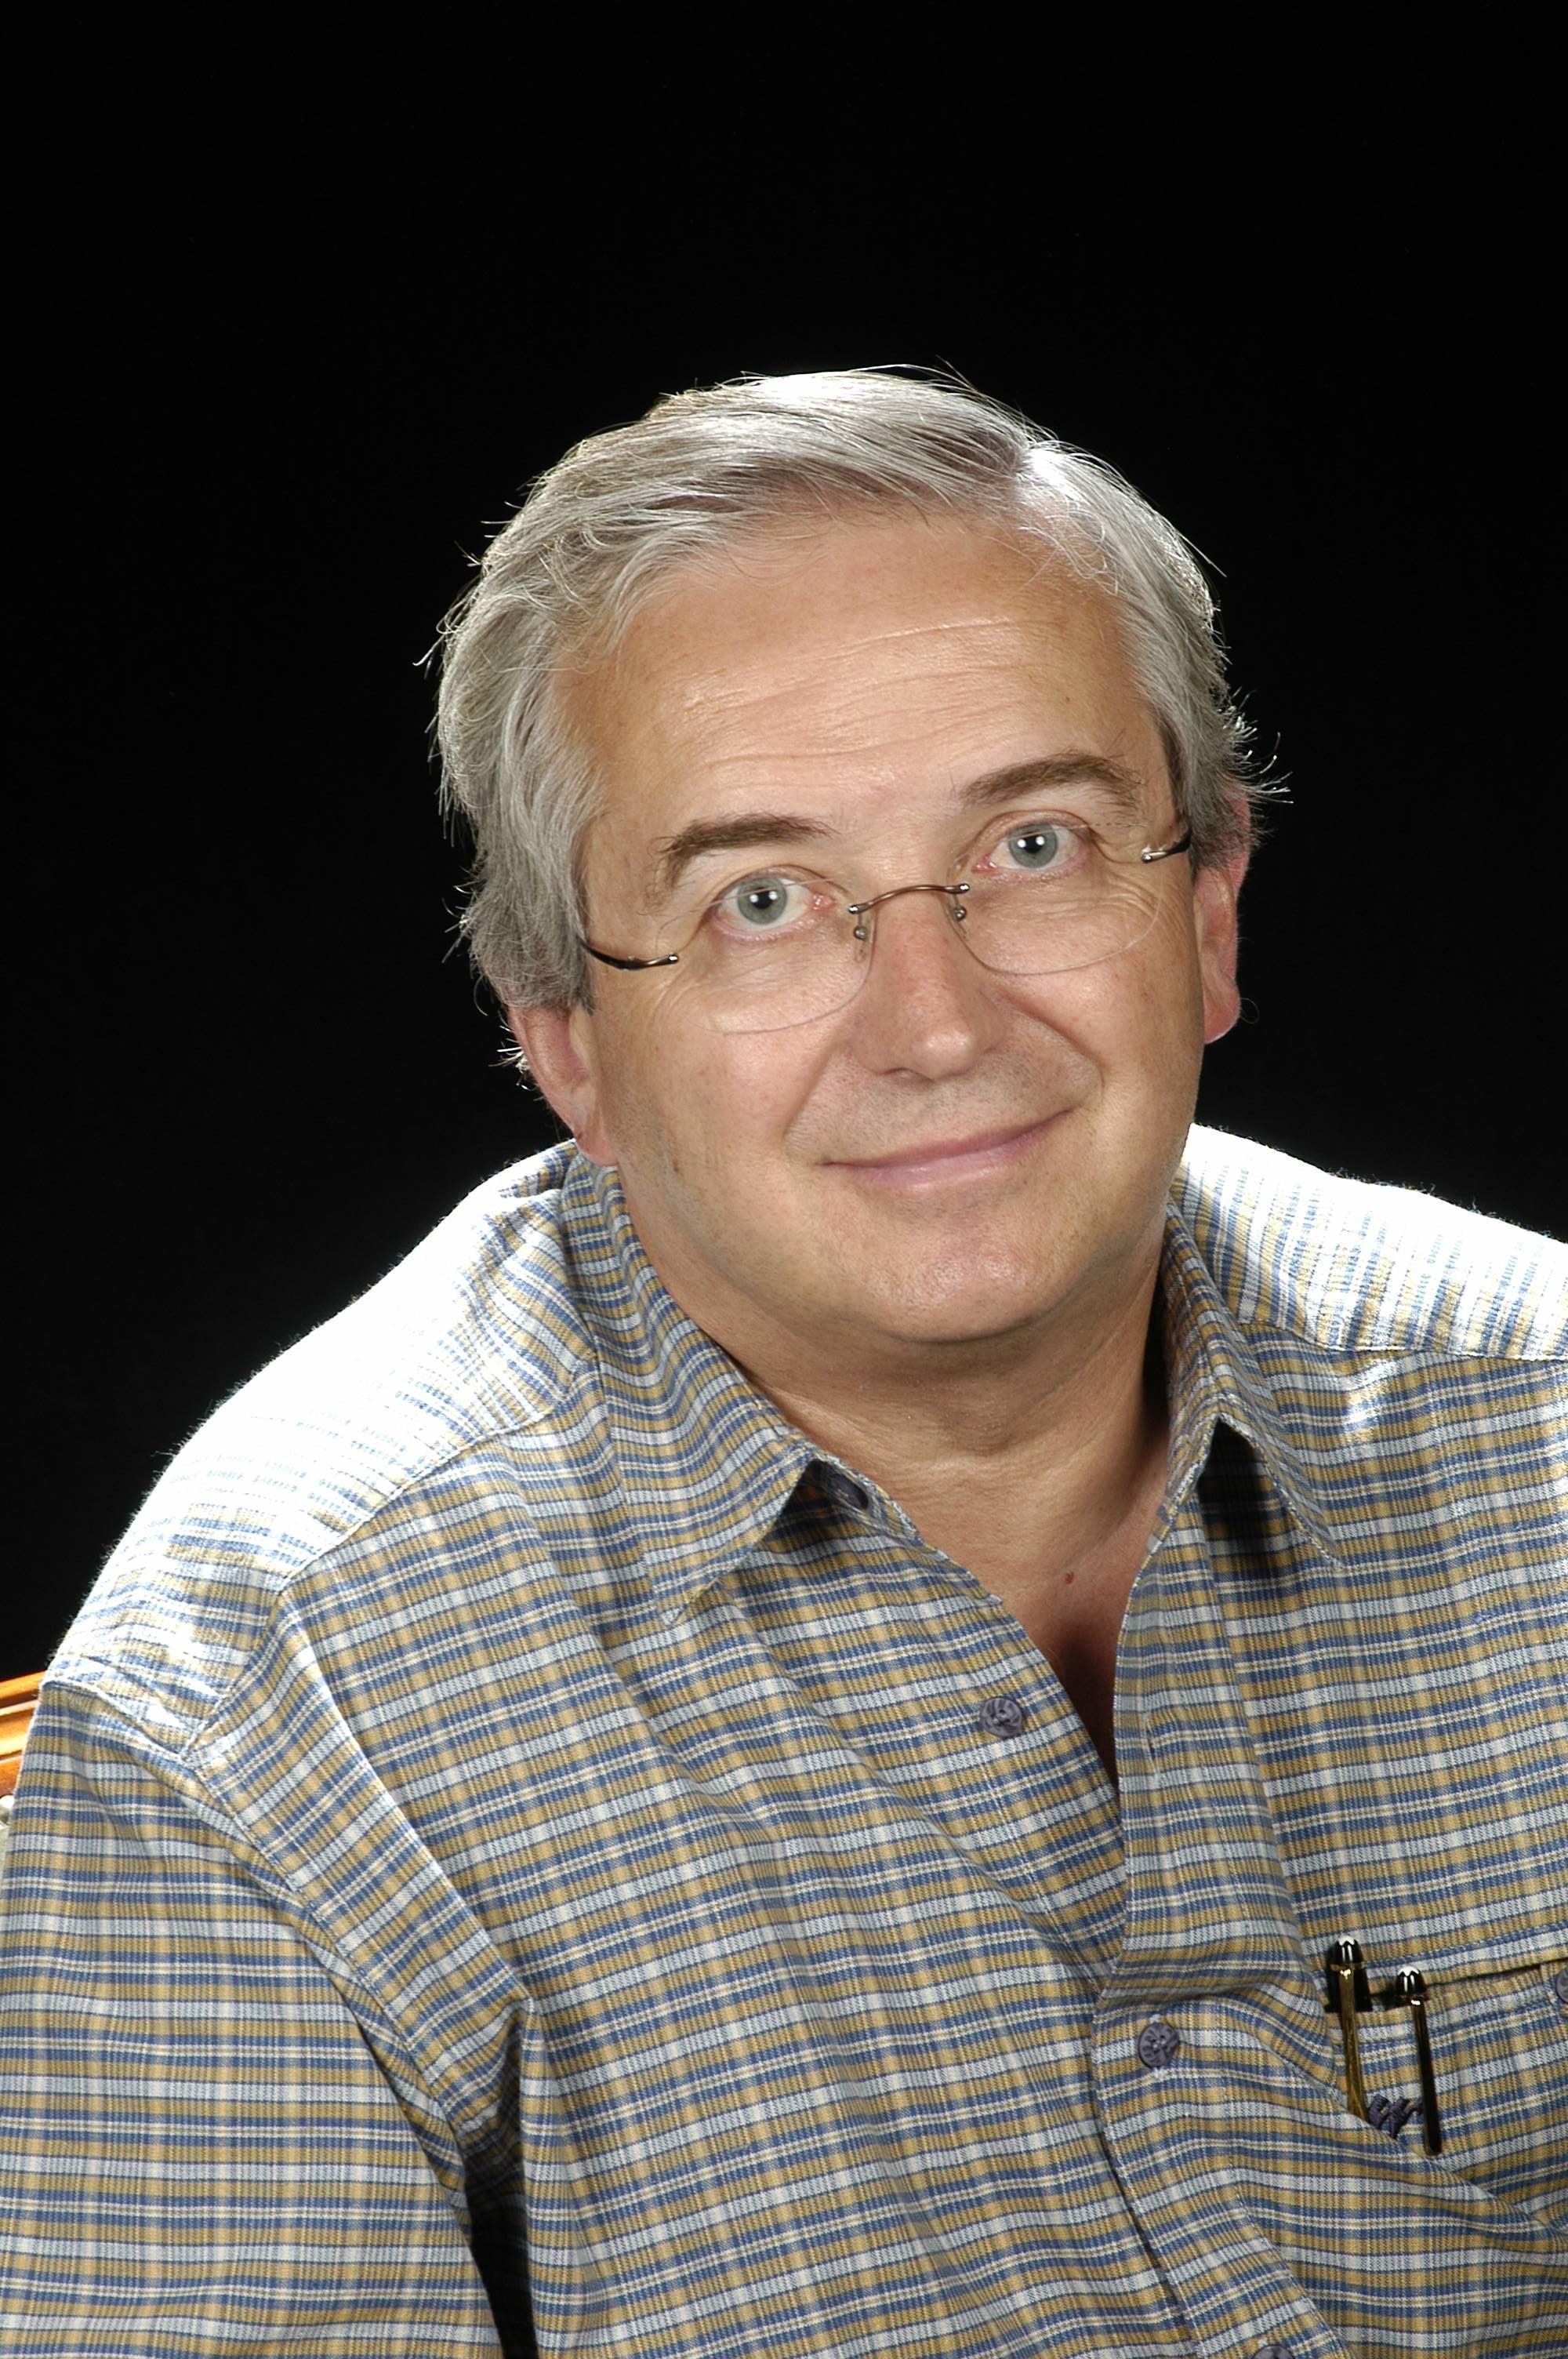 Dr. Jaume Reventós Puigjaner